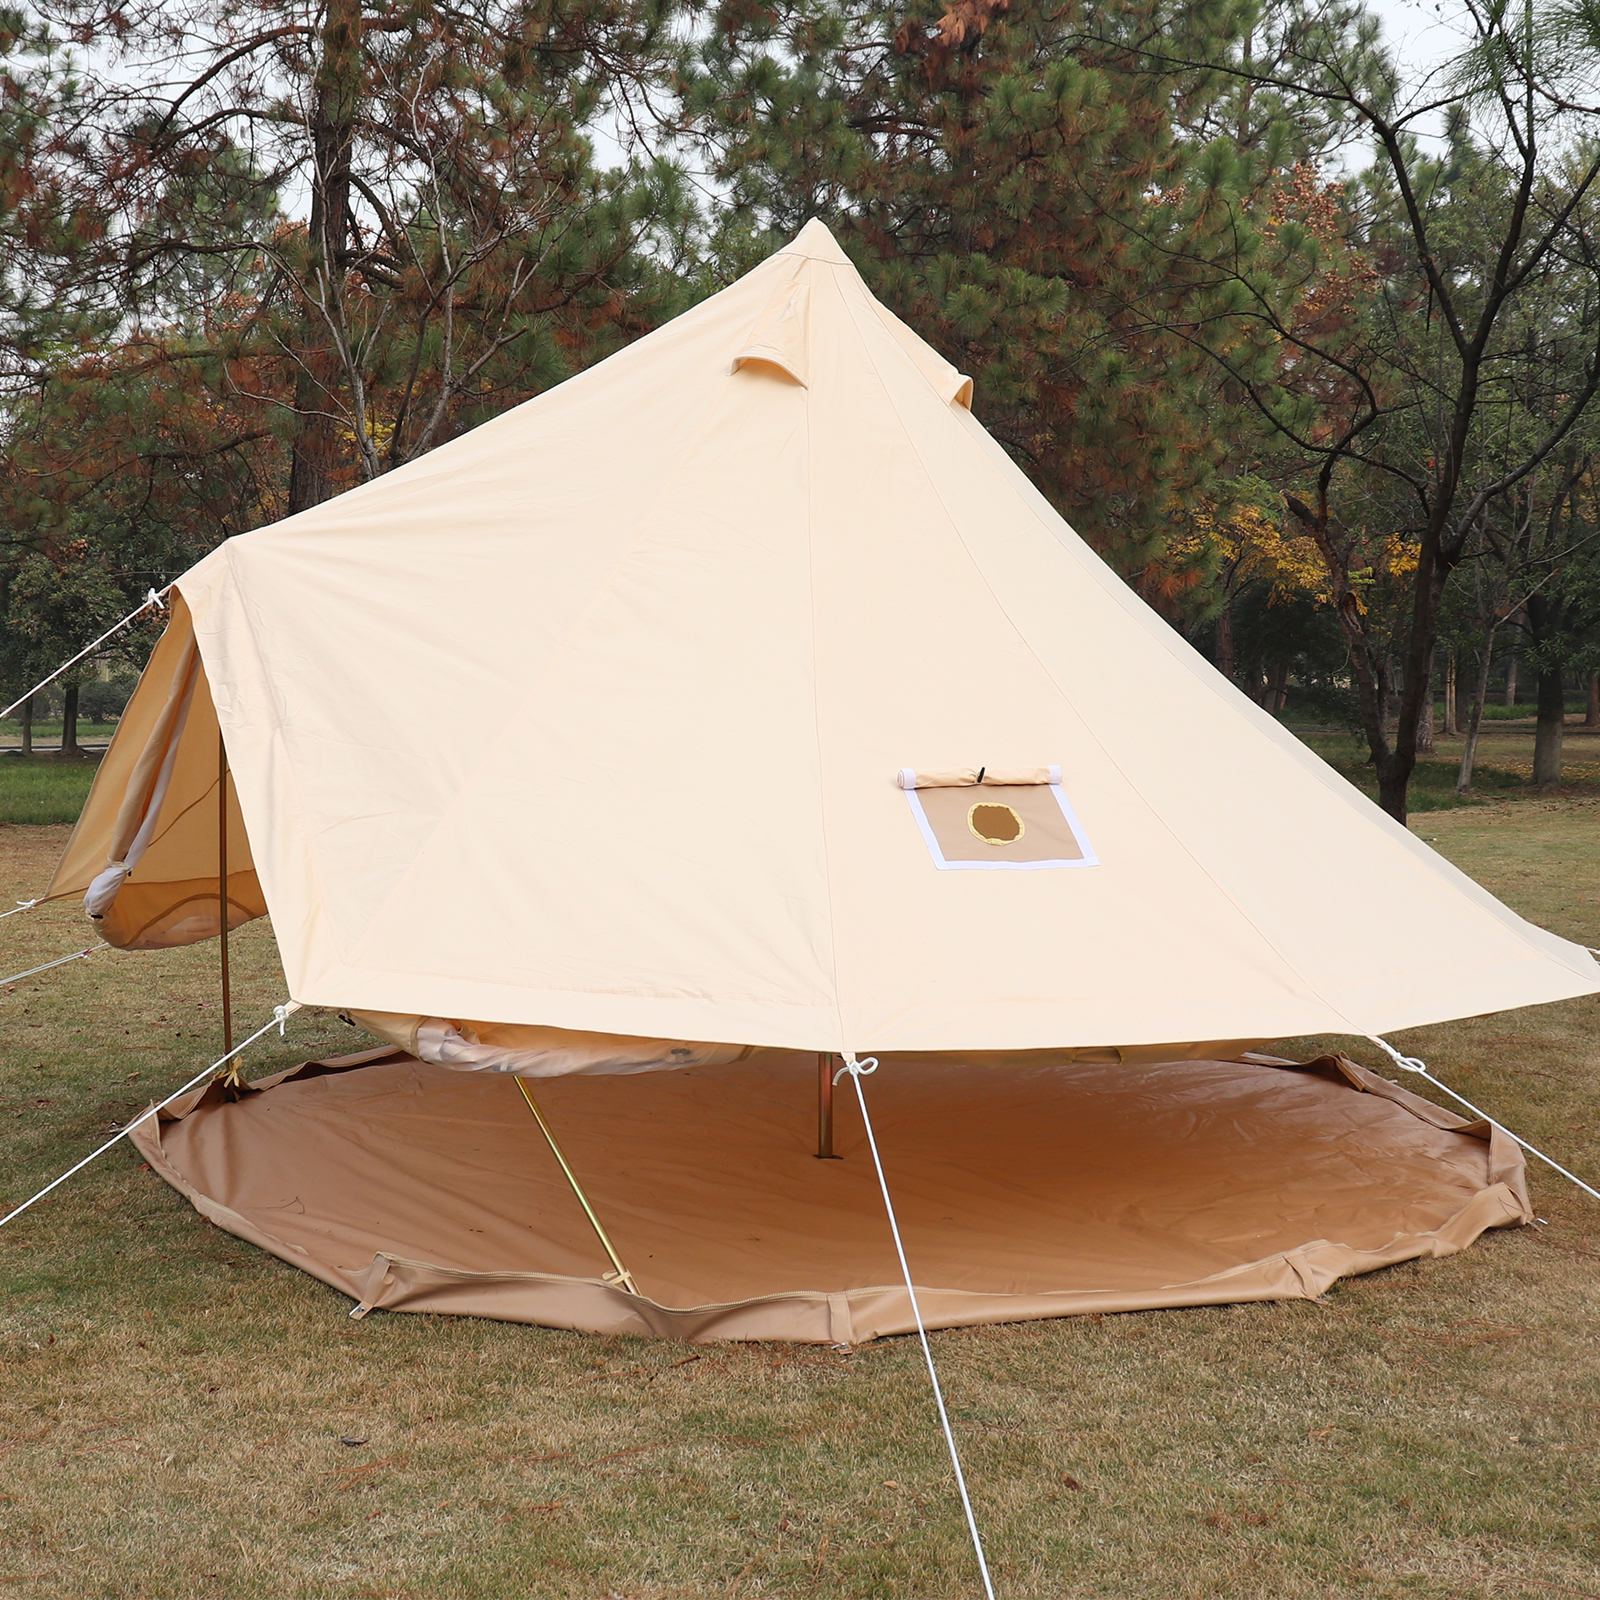 4-Season-Bell-Tent-3-4-5-6M-Waterproof-Cotton-Canvas-Glamping-Camping-Beach-US thumbnail 47